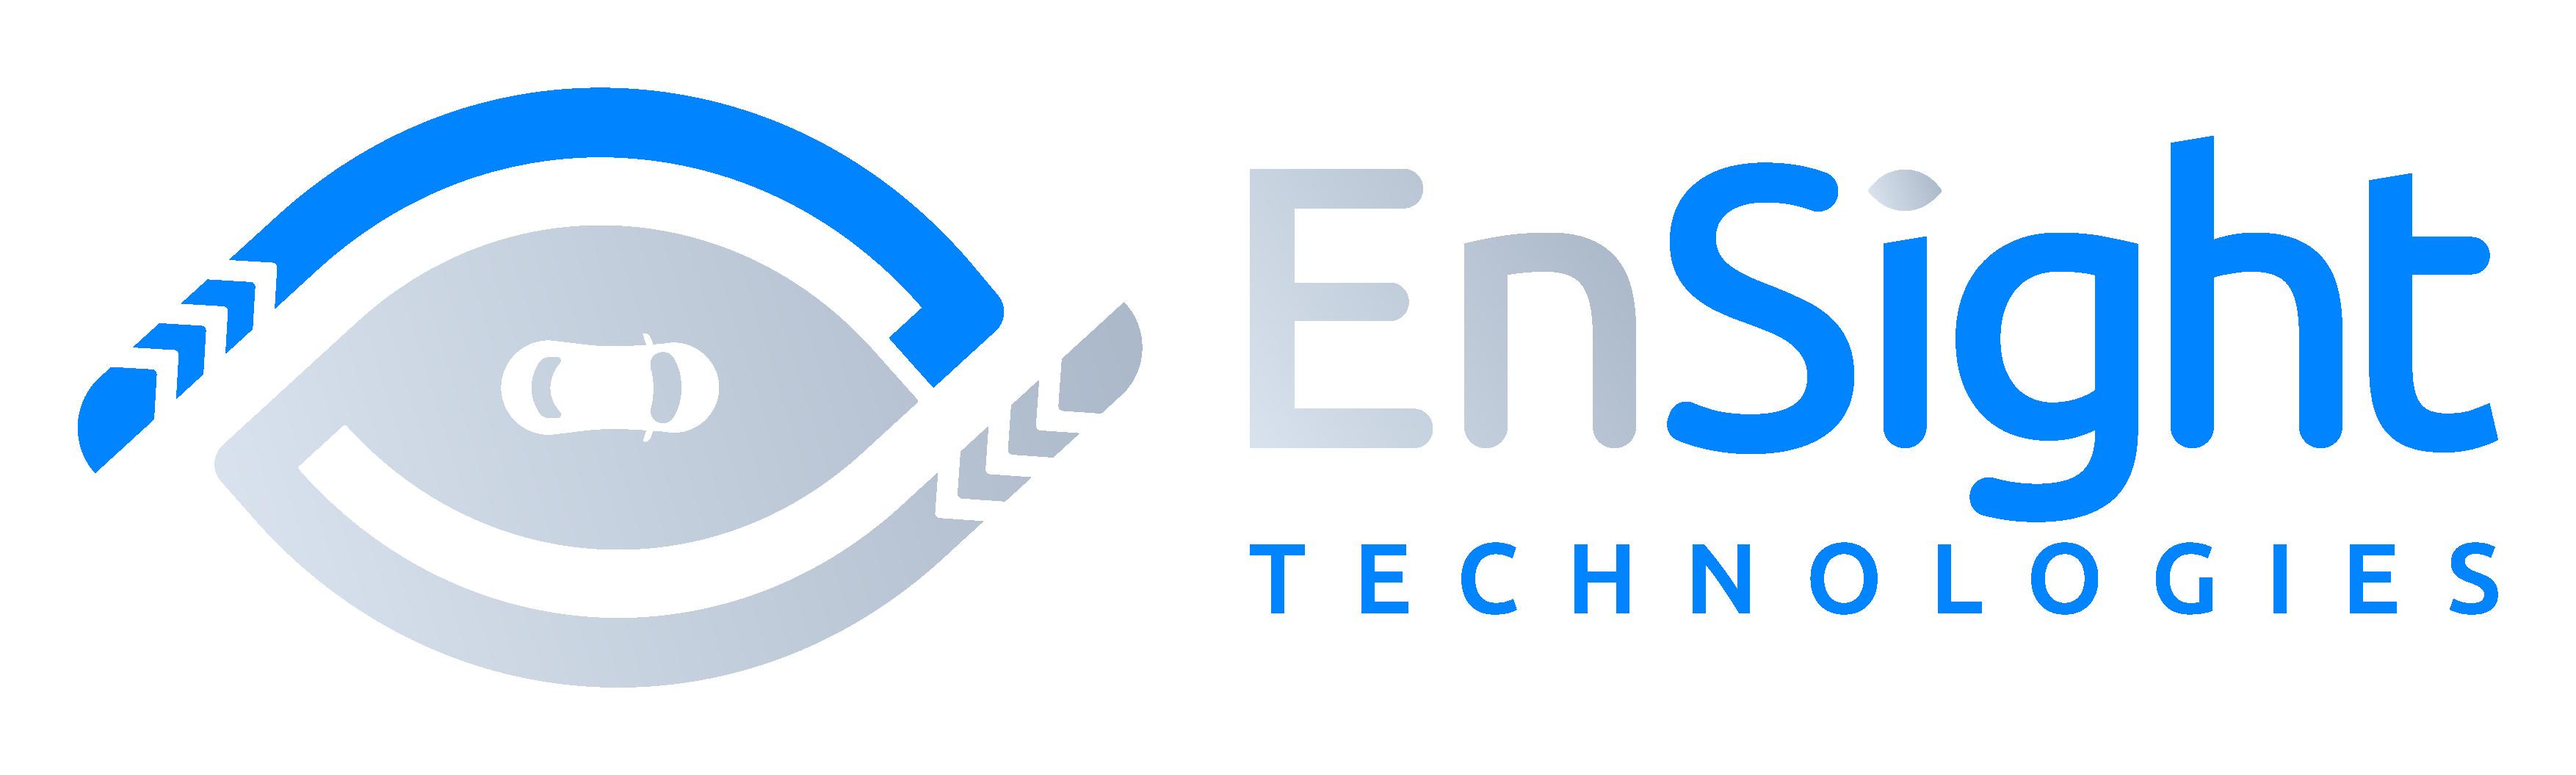 EnSight Technologies logo